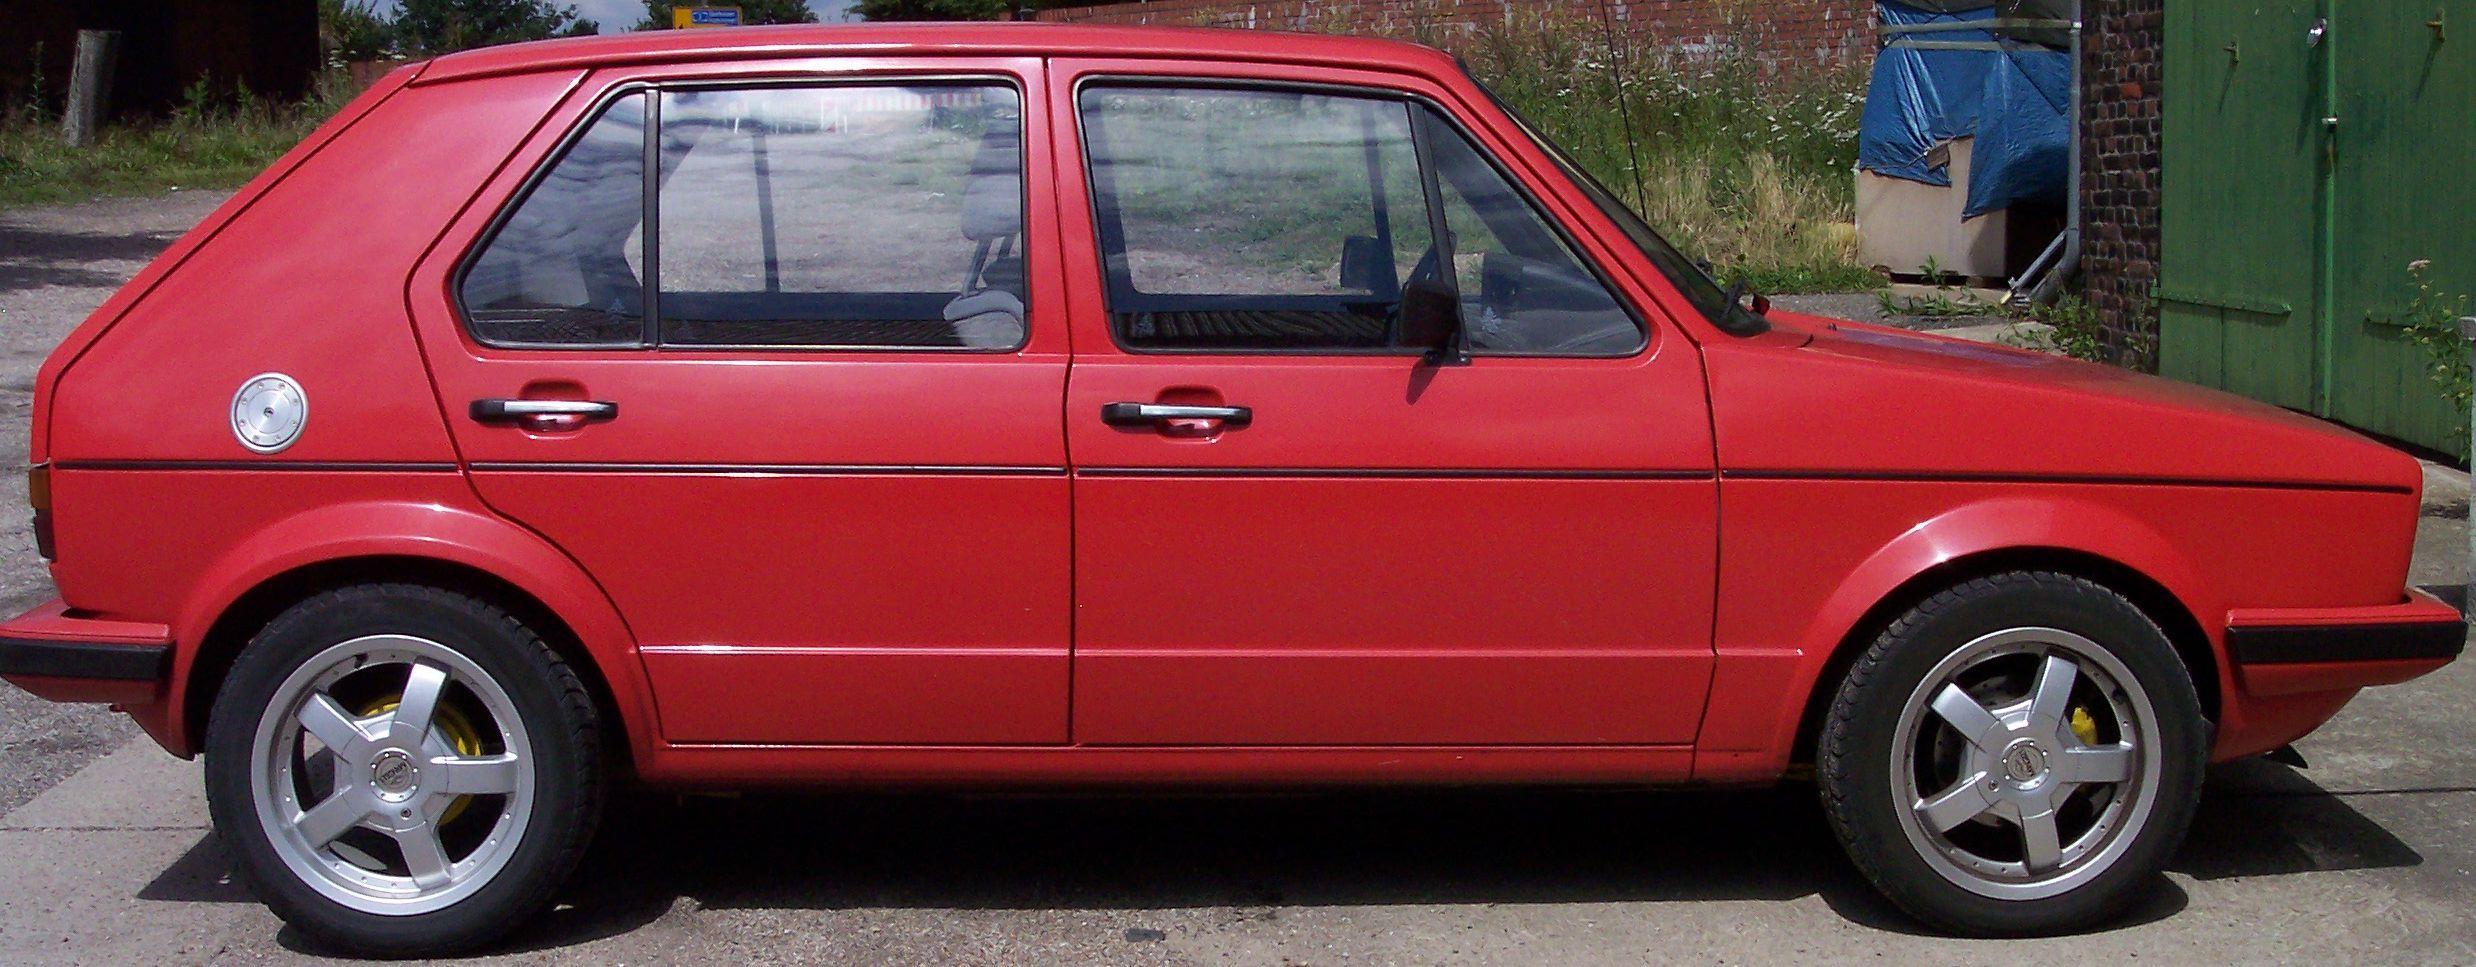 Volkswagen Golf I Red